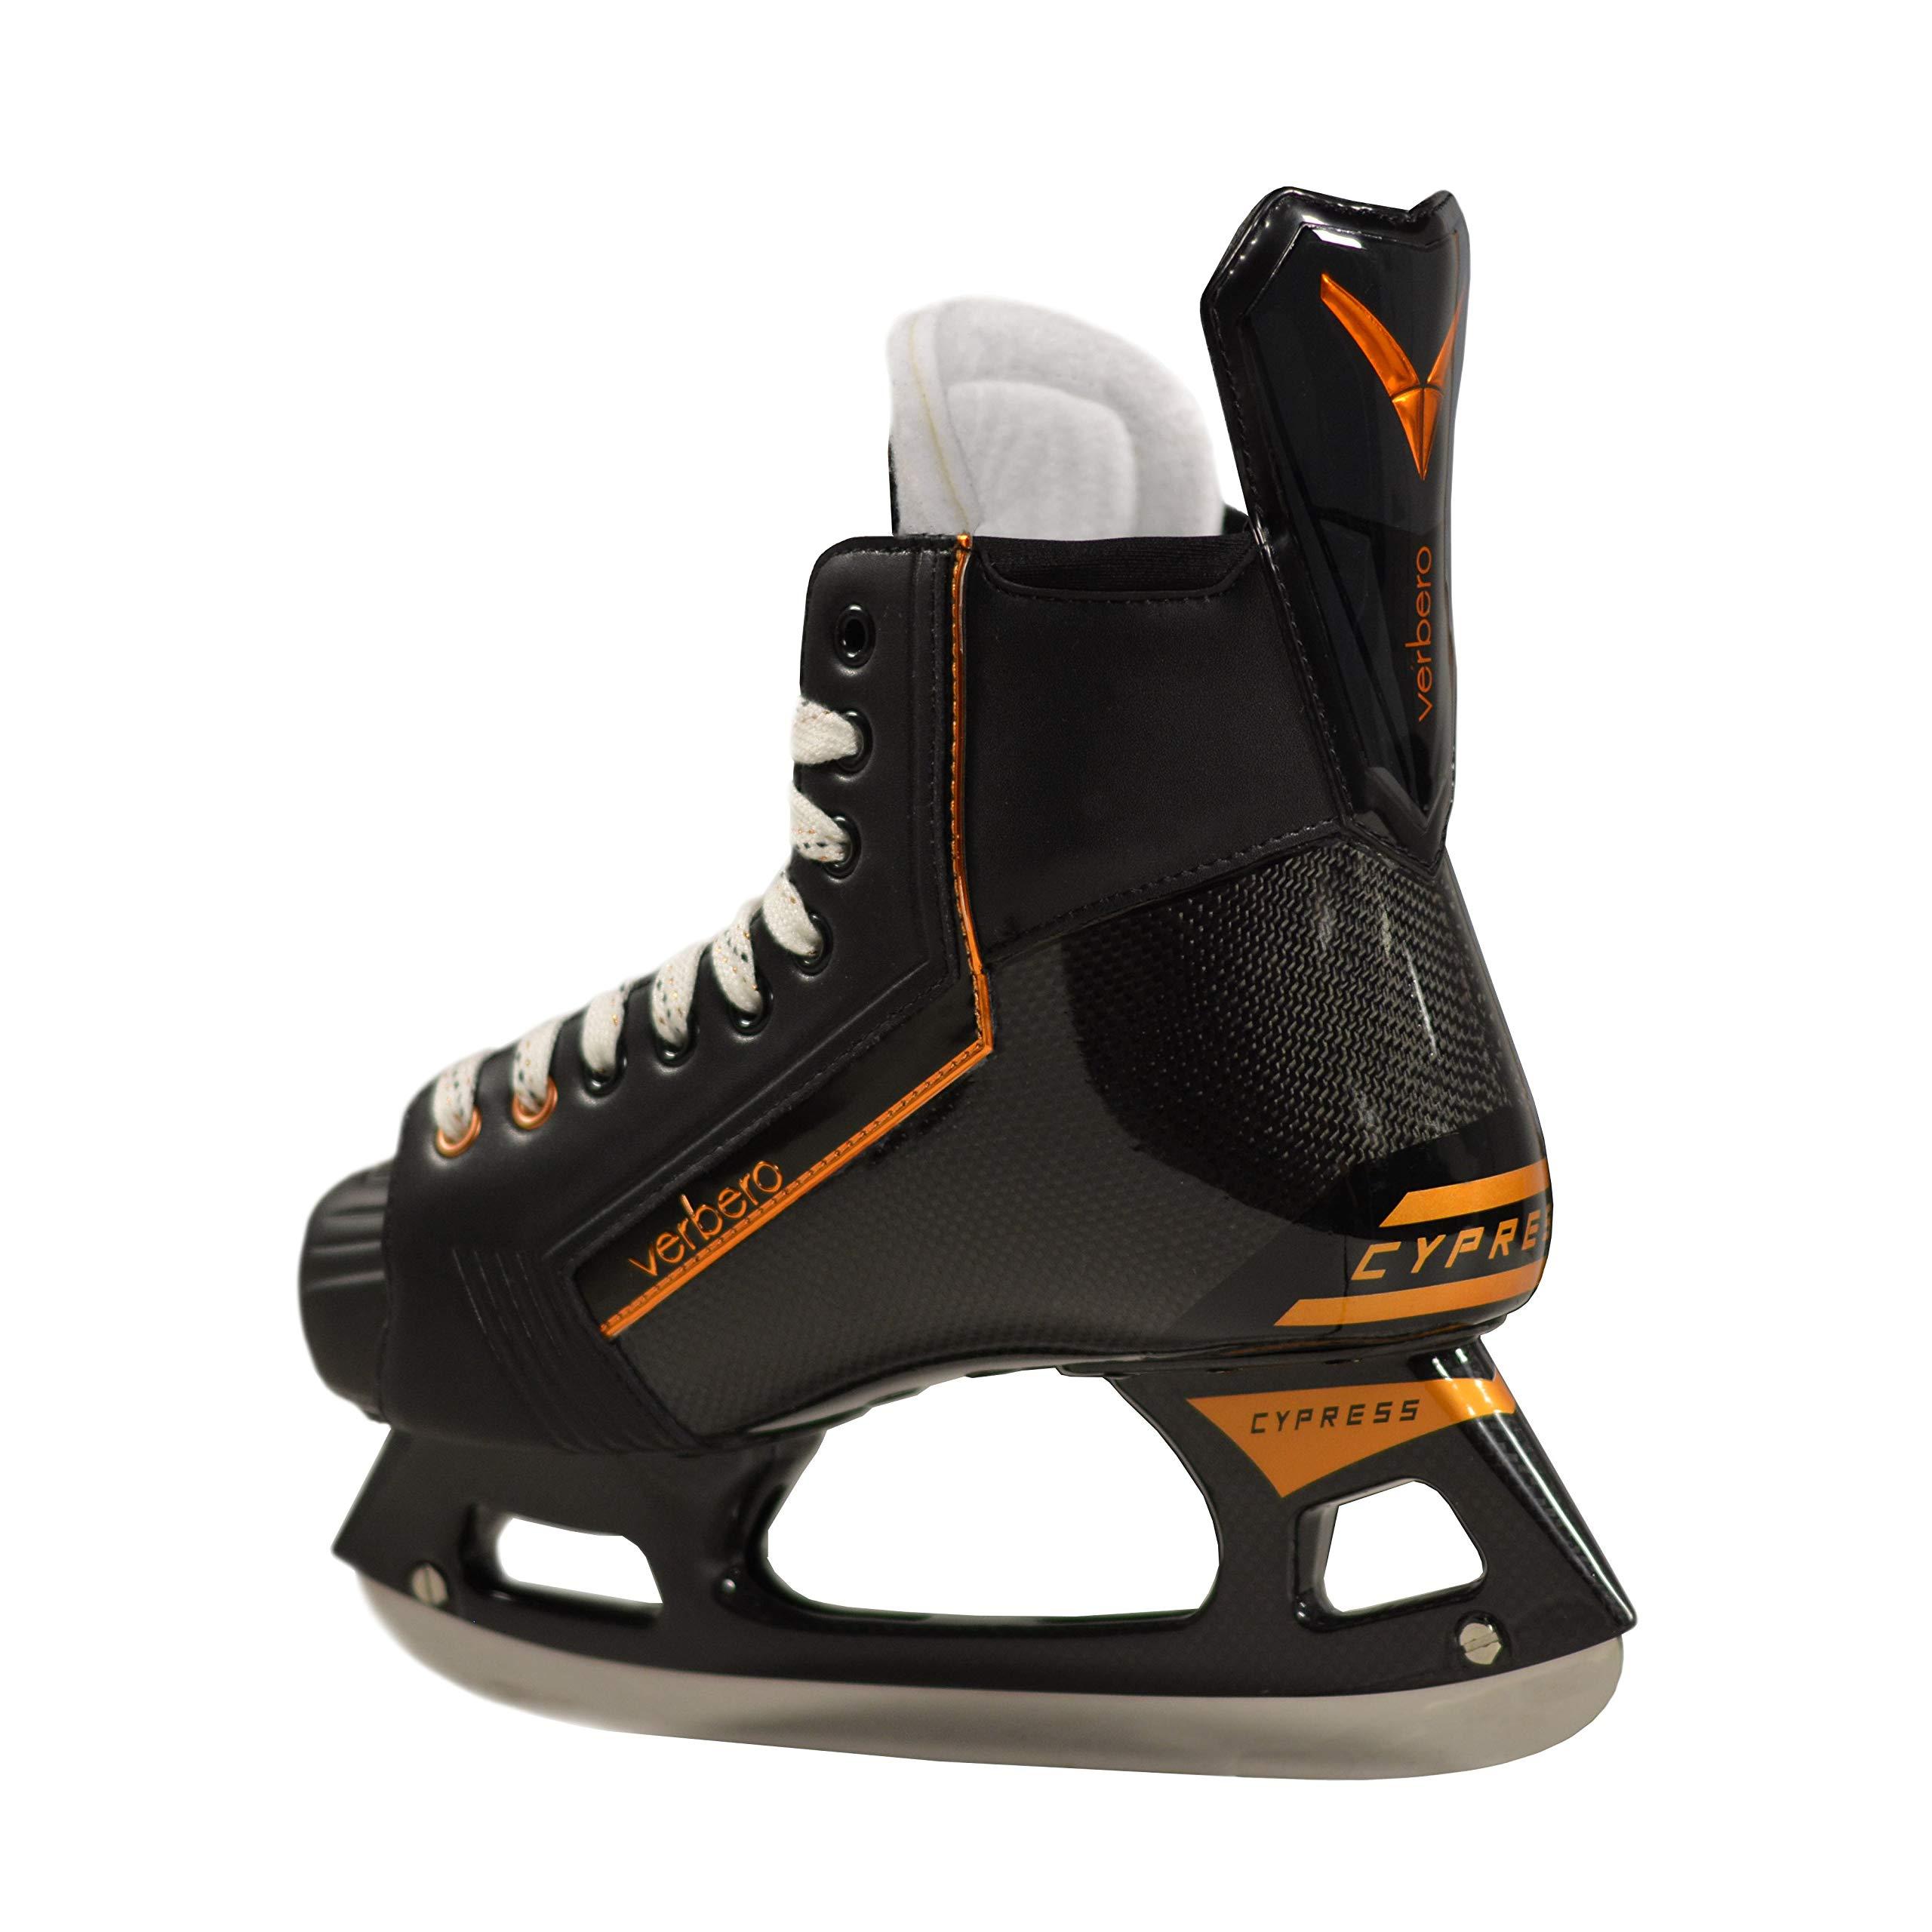 VERBERO Cypress Pro+ Ice Hockey Skate (Black 6.0) by VERBERO (Image #4)